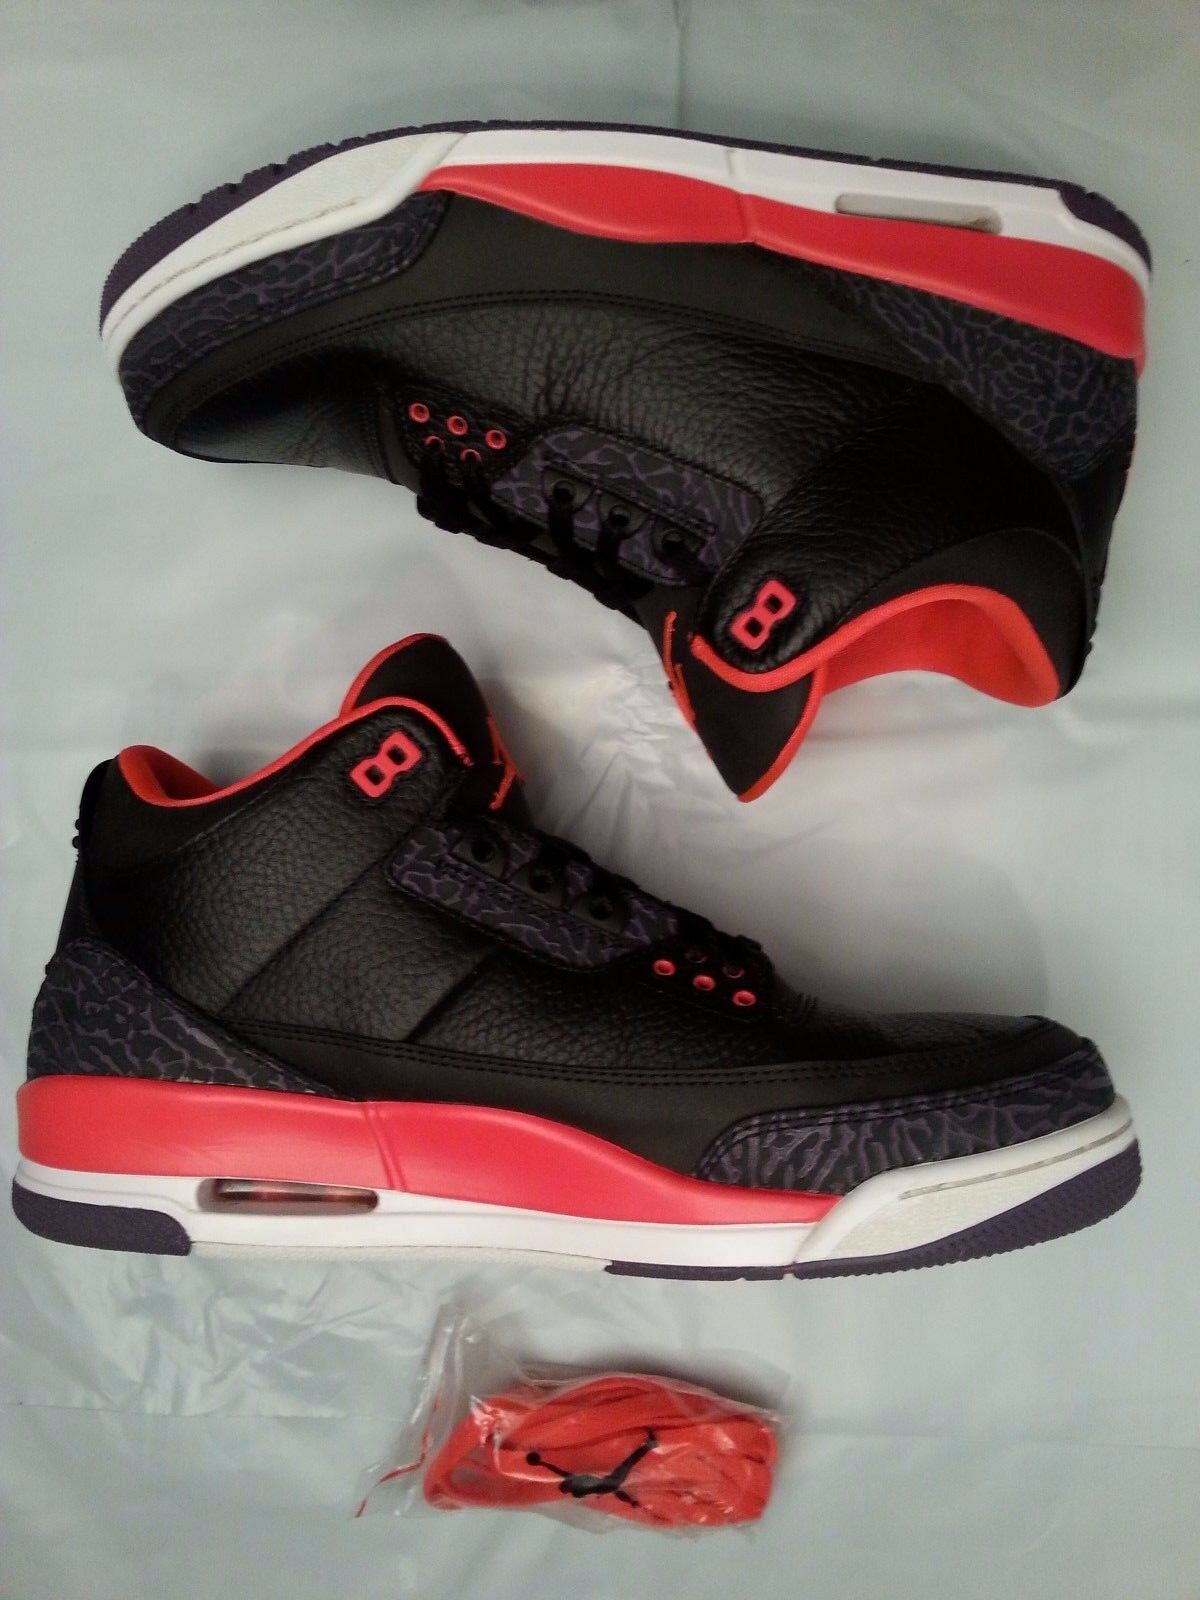 Nike Air Jordan Retro 3 III Size 11.5 Crimson Red Black Purple. 136064-005.